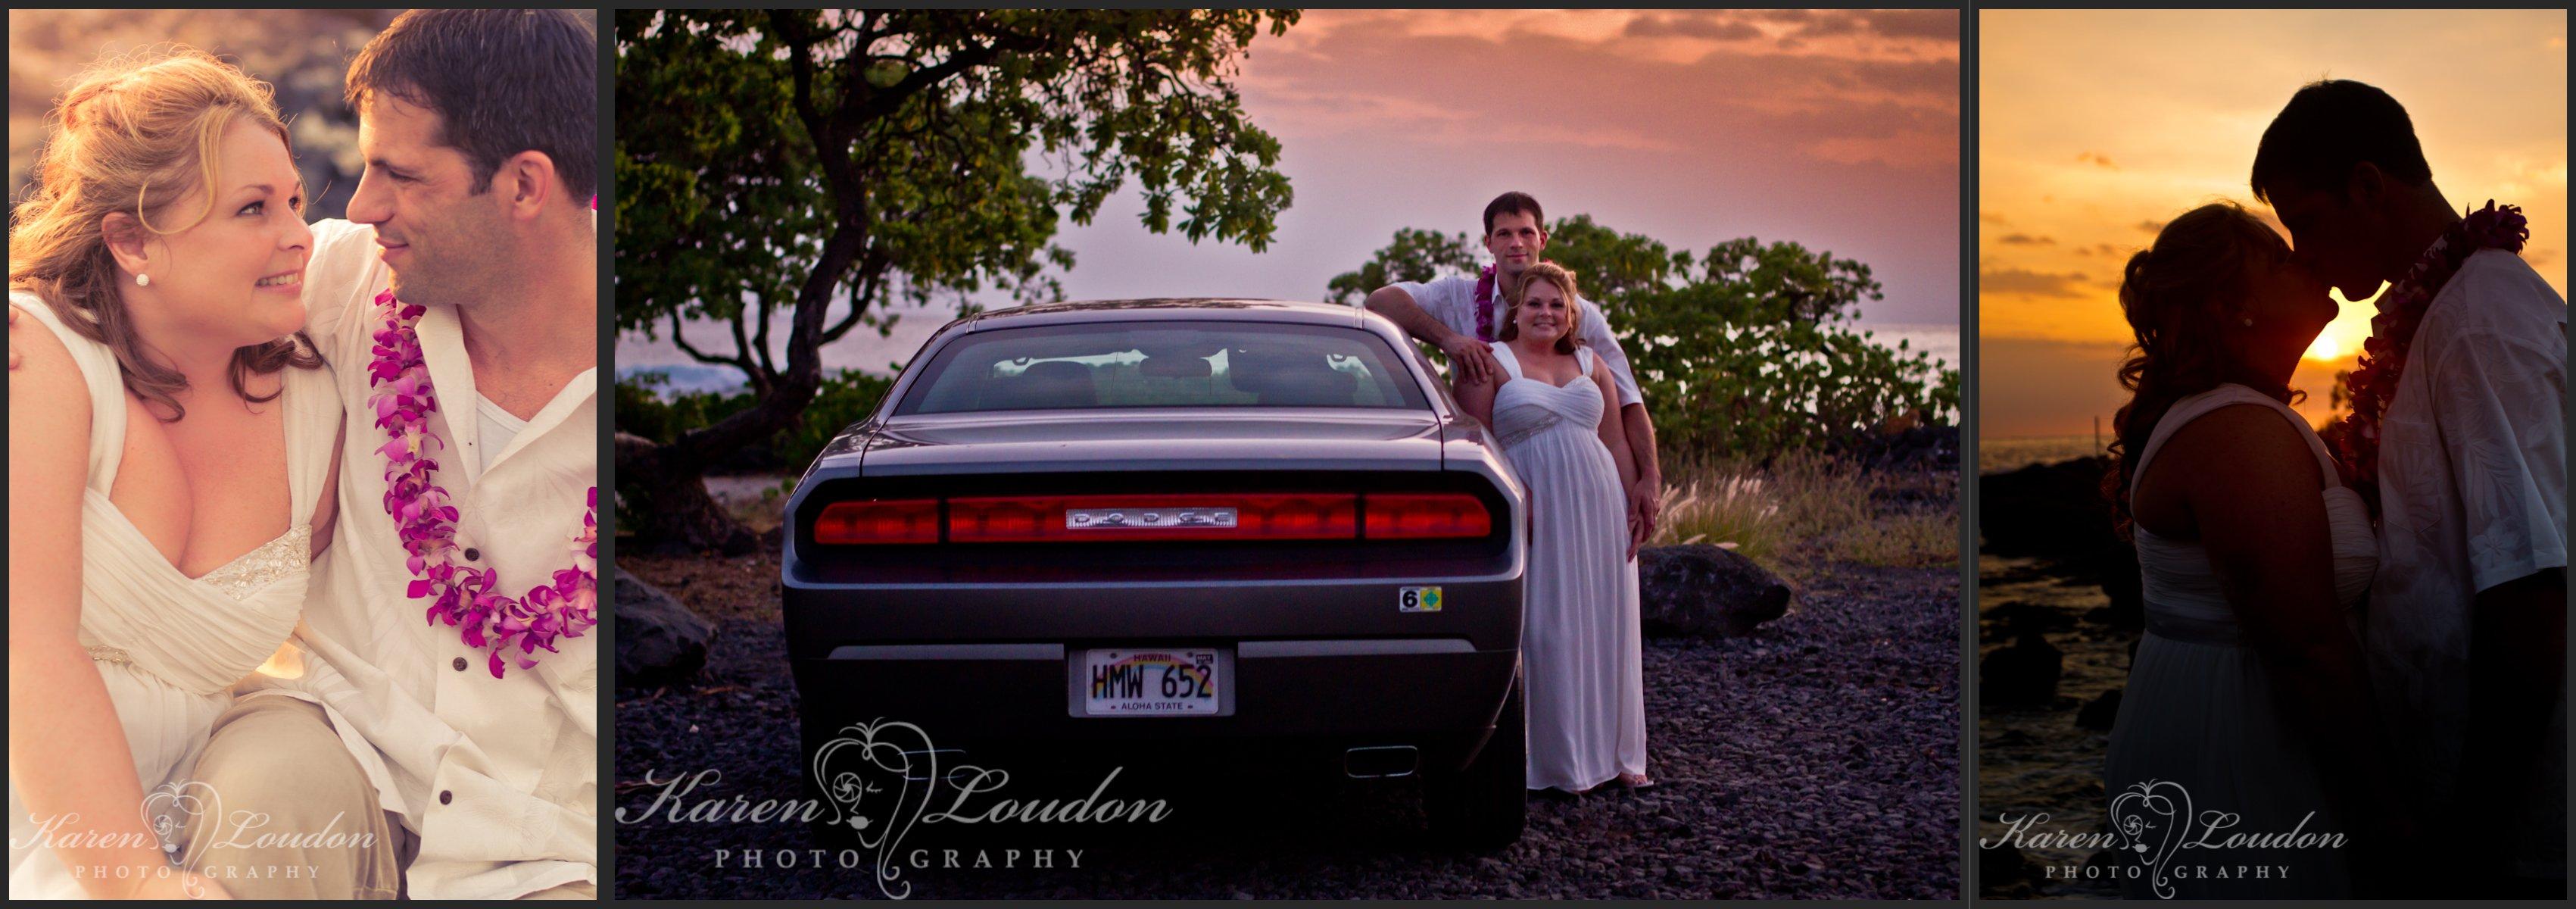 Jodie and Brian, Kailua-Kona, Big Island Hawaii